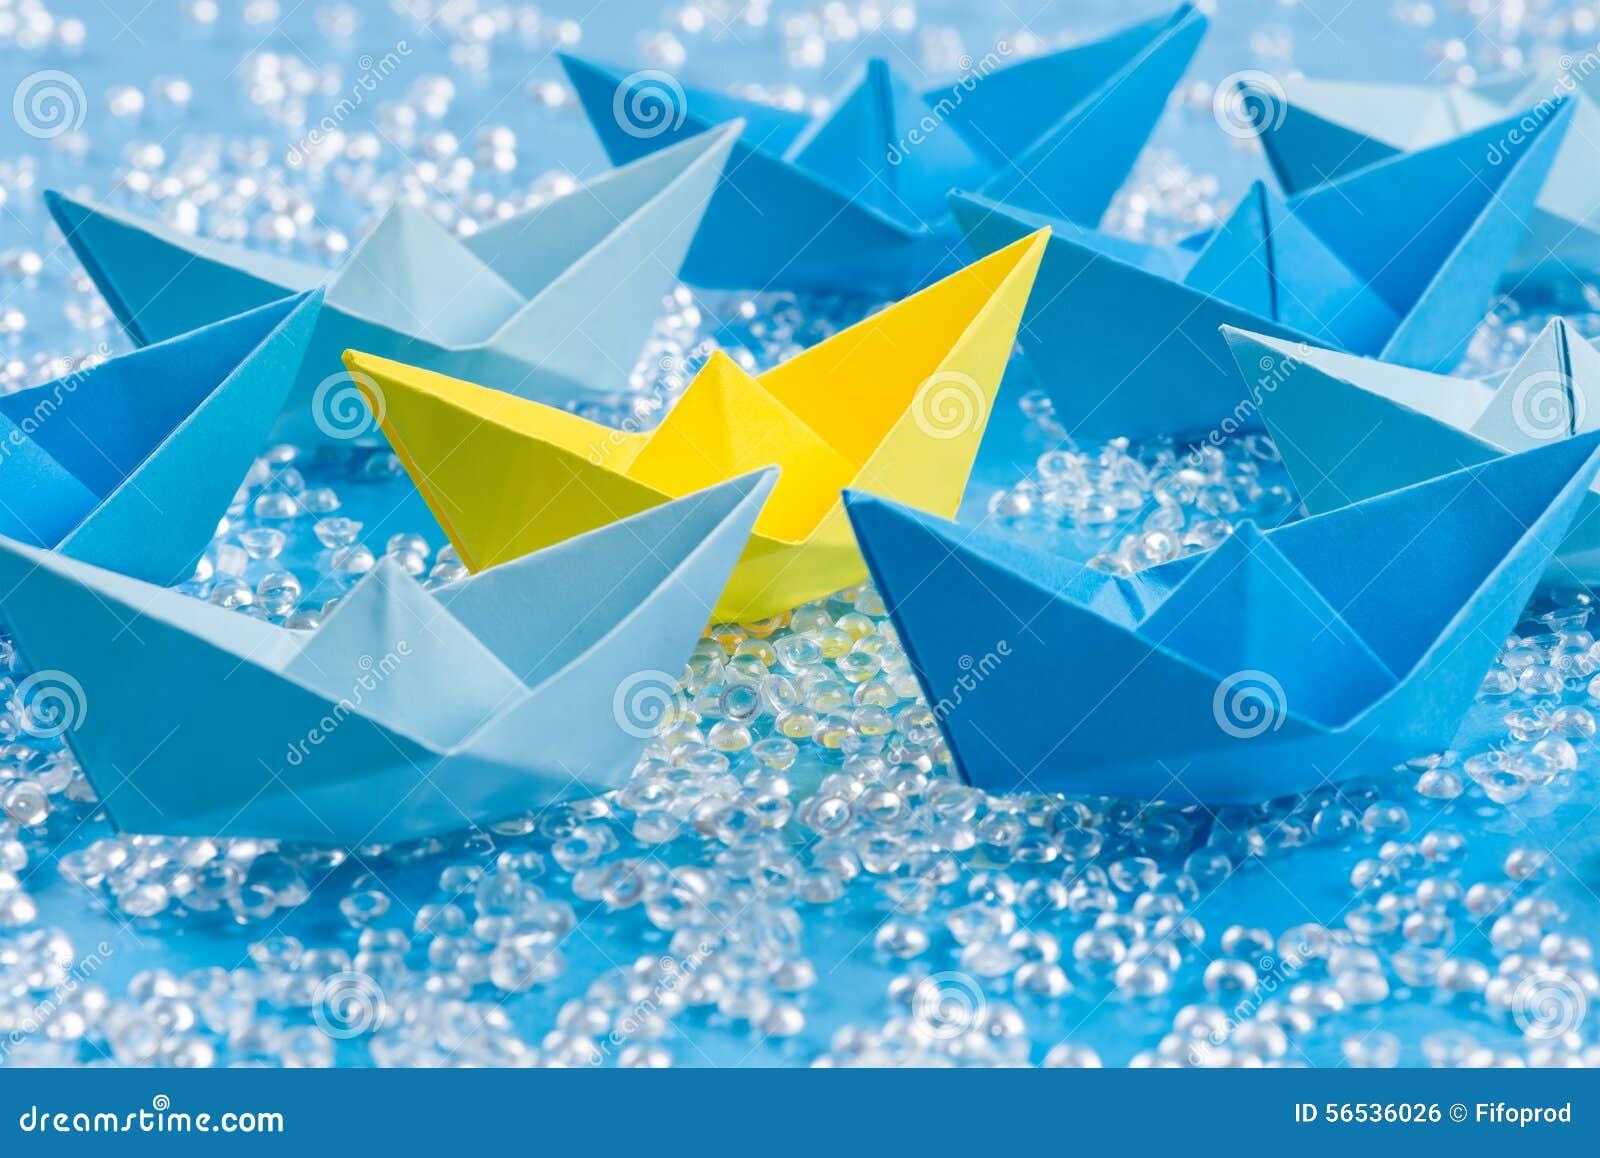 Flotta av blått origamipapper sänder på blått vatten som bakgrund som omger gul